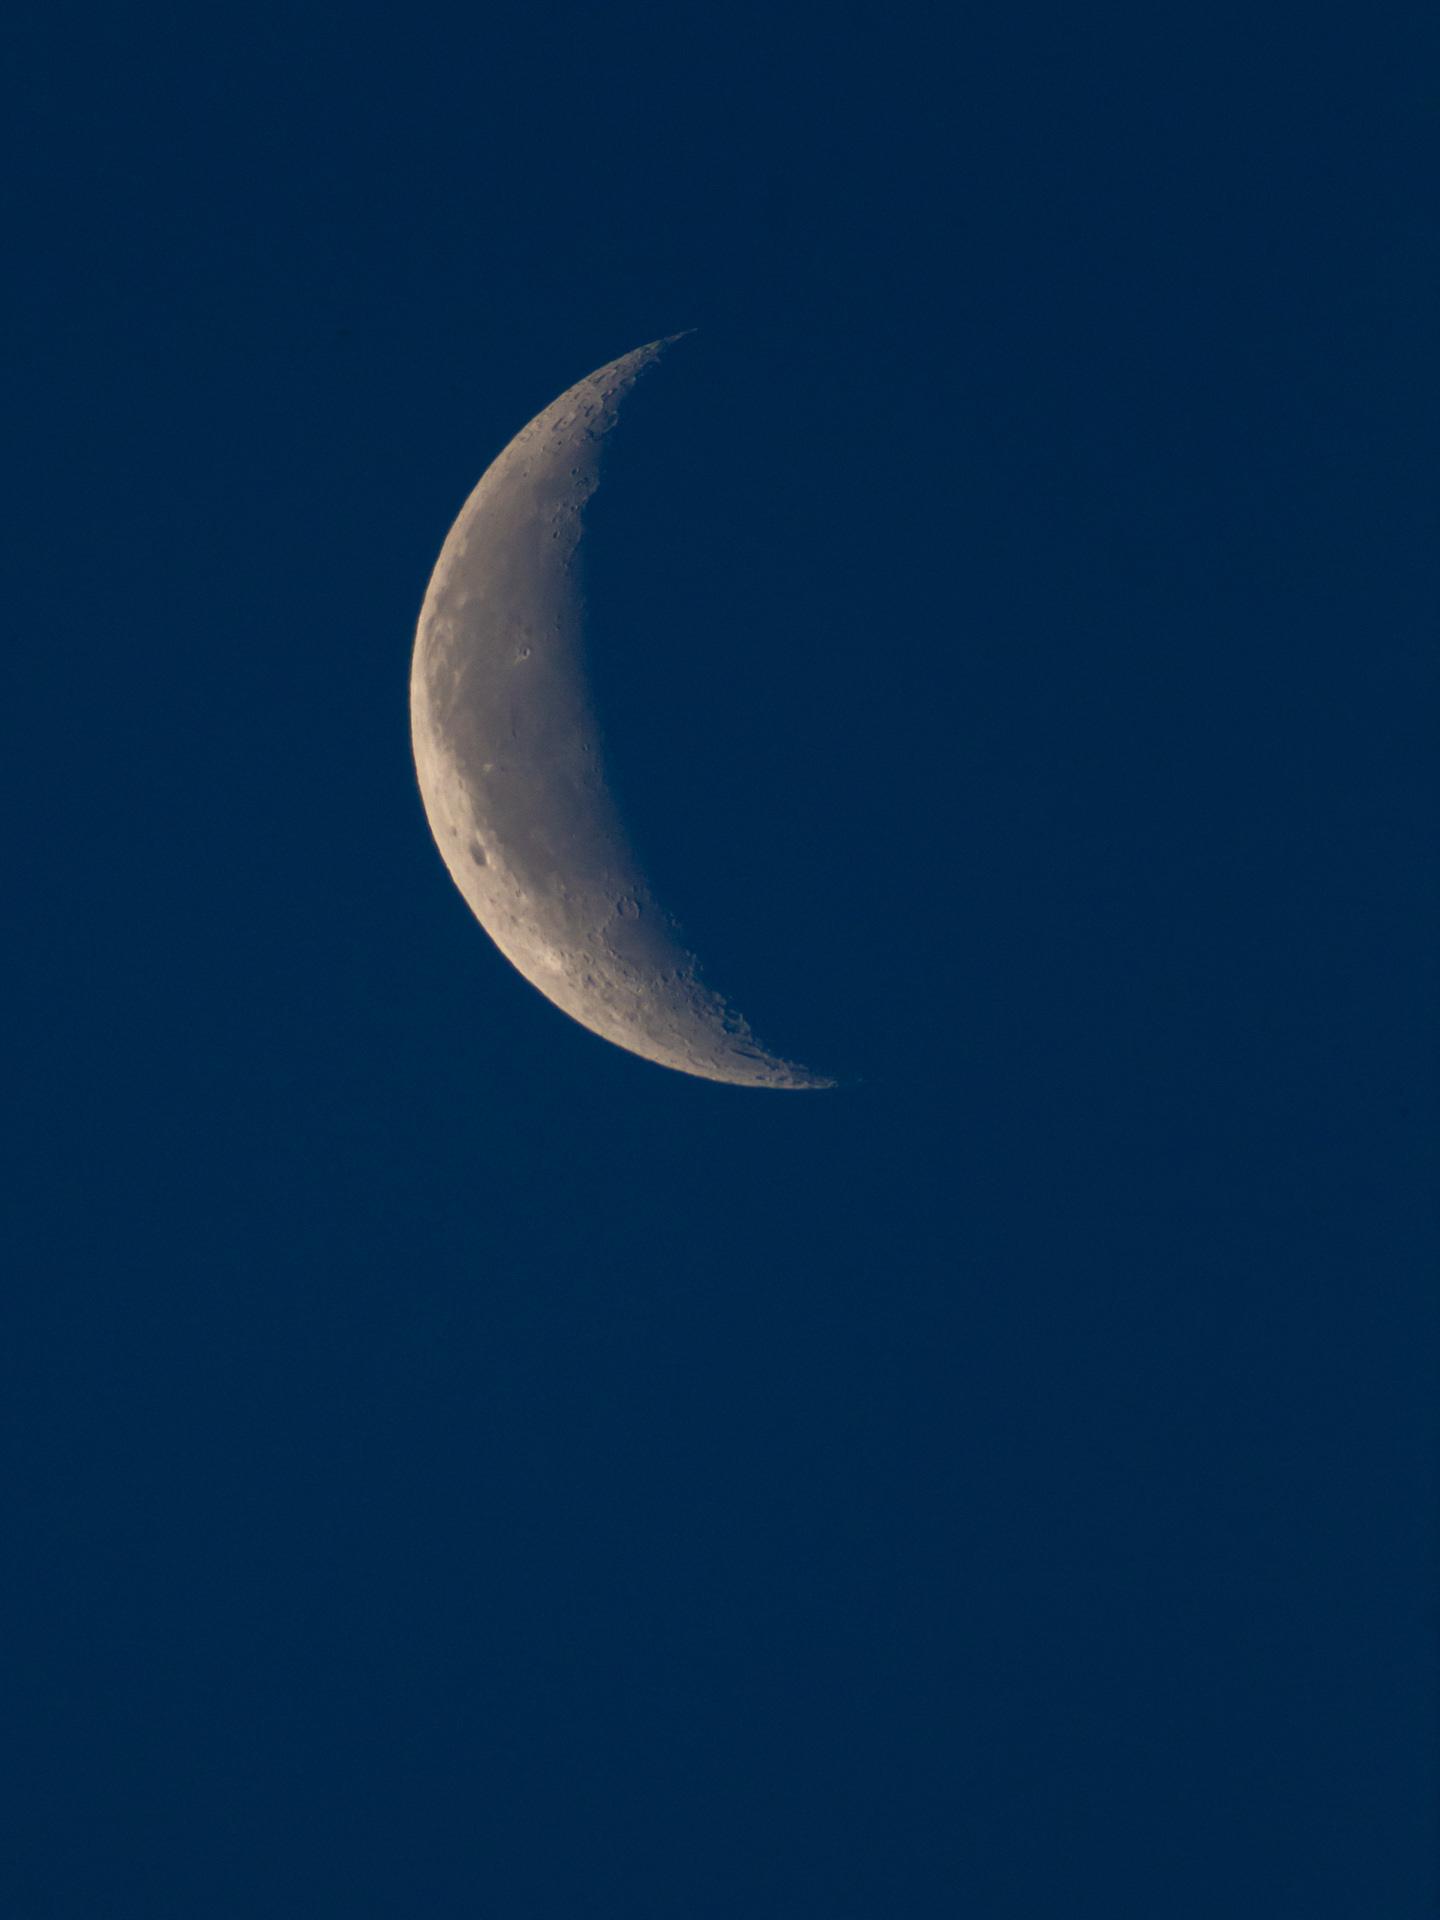 Waning Crescent Moon at Sunrise | 20190529 0540 E:38.96x77.00@84m